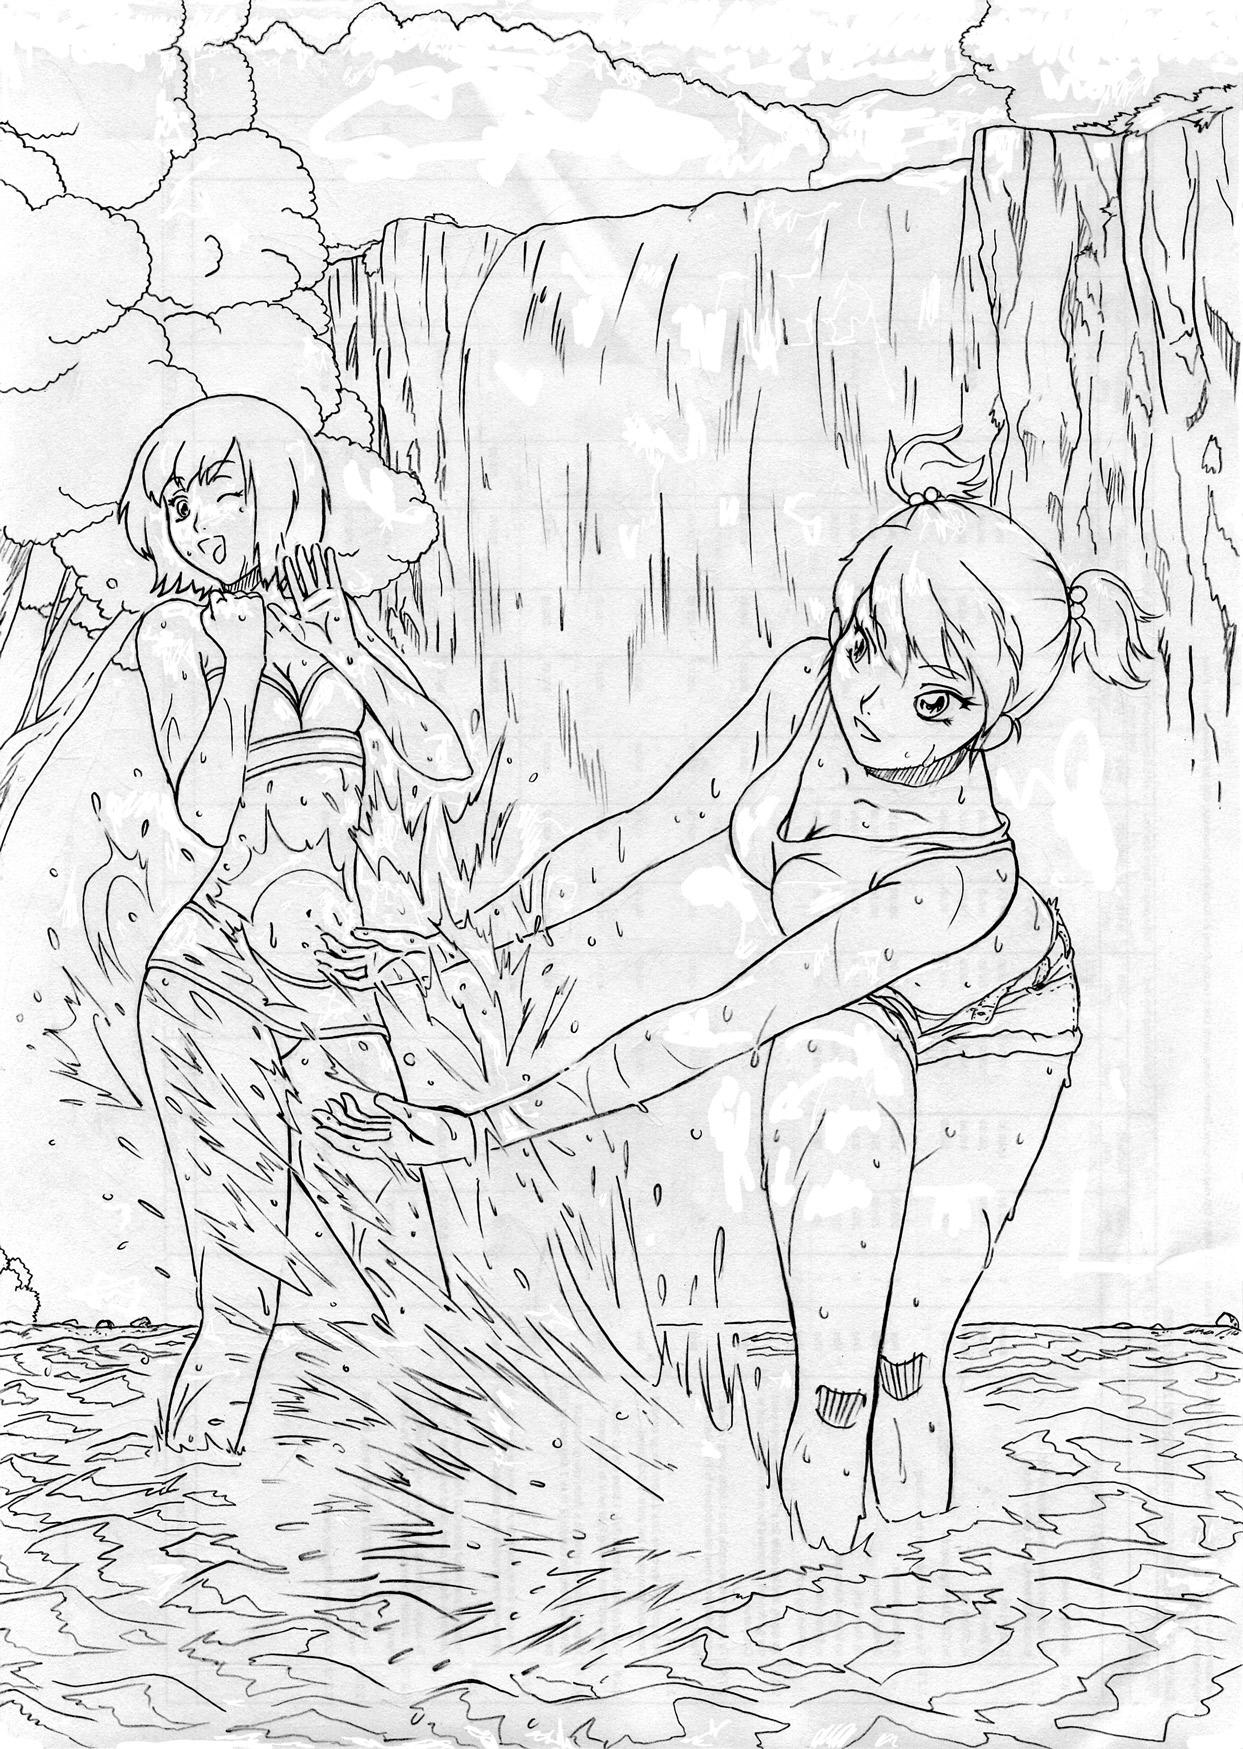 Waterfall Girls by Minikrom